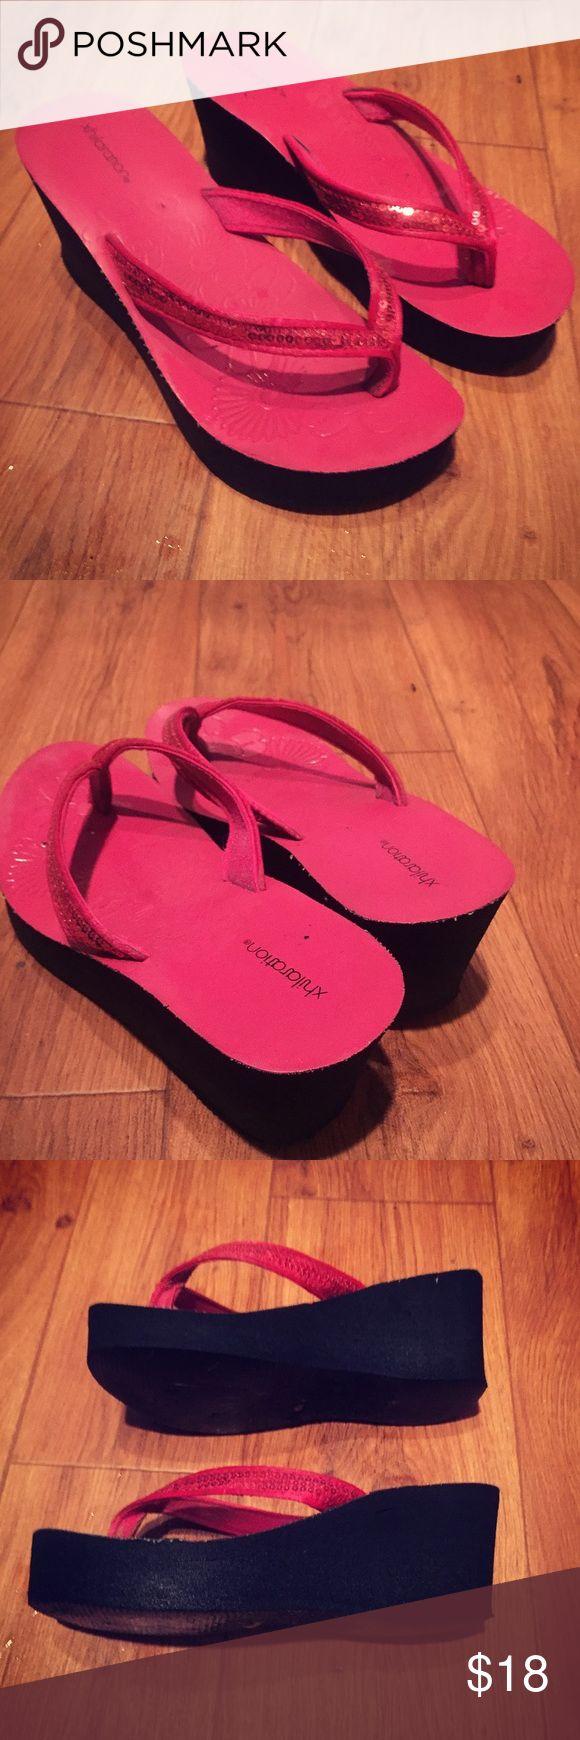 ☀️ Pink Wedge Sandals Flip Flops Xhileration by Target. Pink wedge sandal thong flip flops. Pink sequin design around front toe. Size 6. Good condition. Xhilaration Shoes Sandals